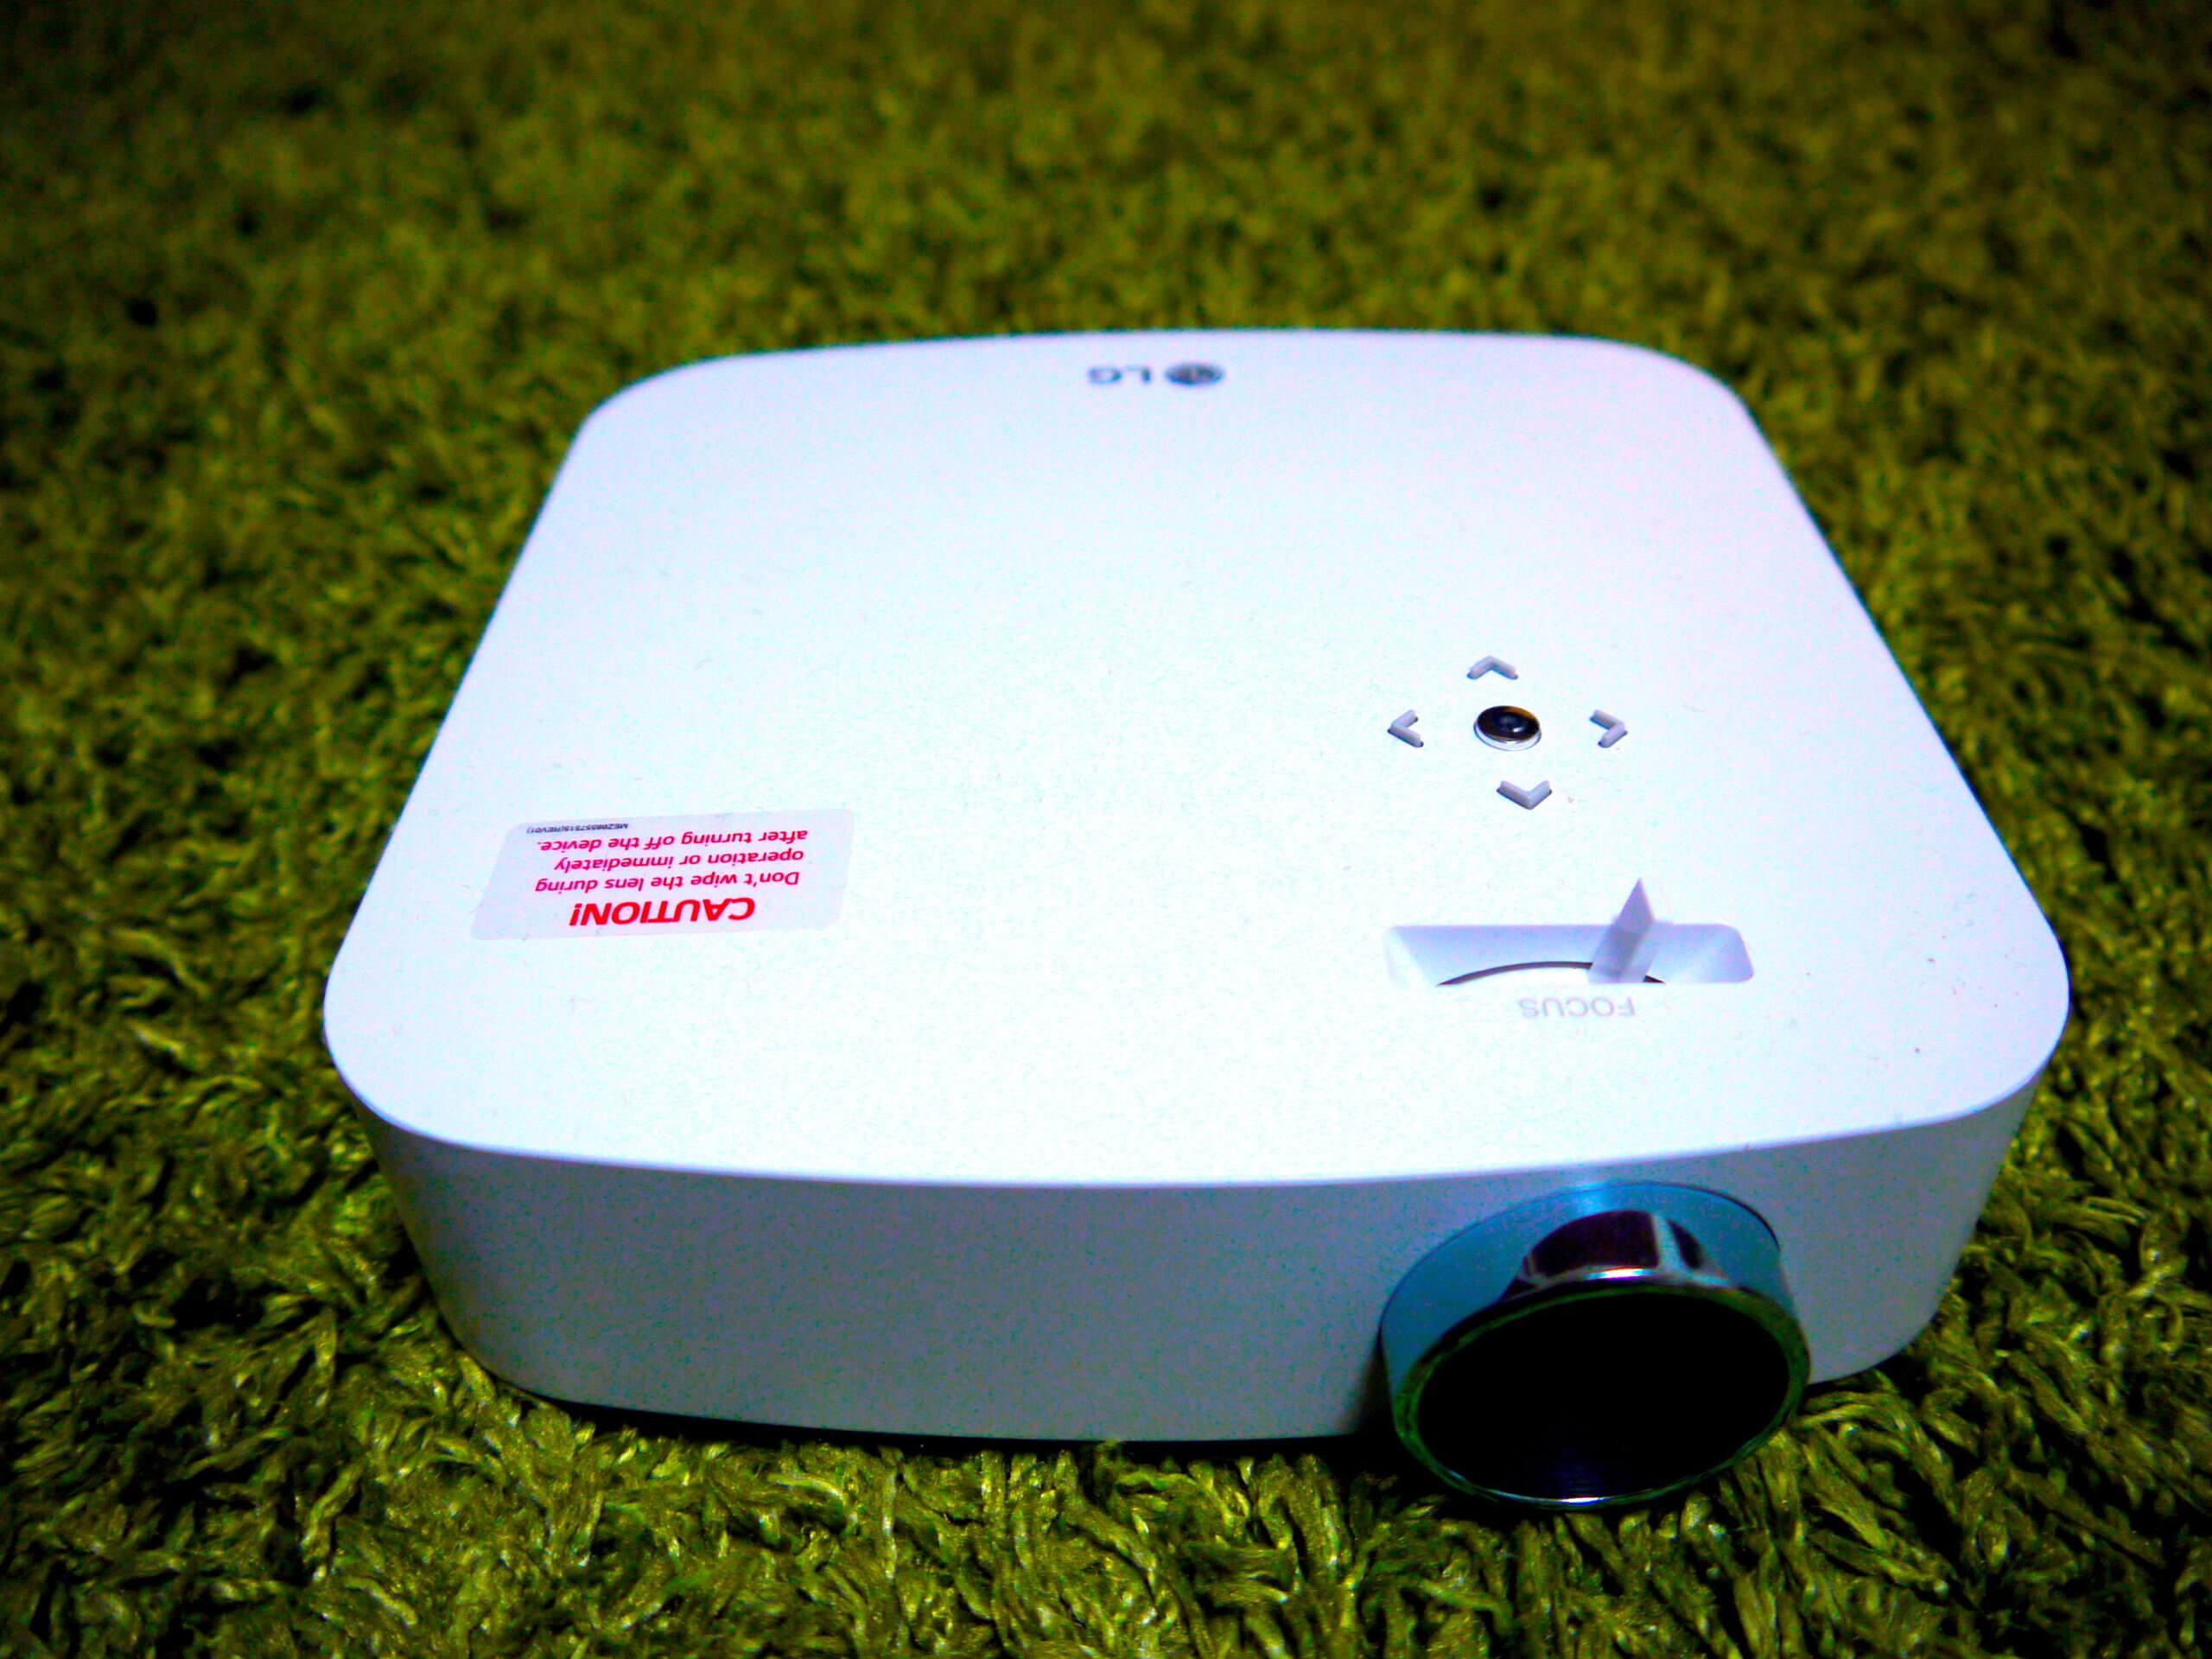 LG pf50Ks プロジェクター画像